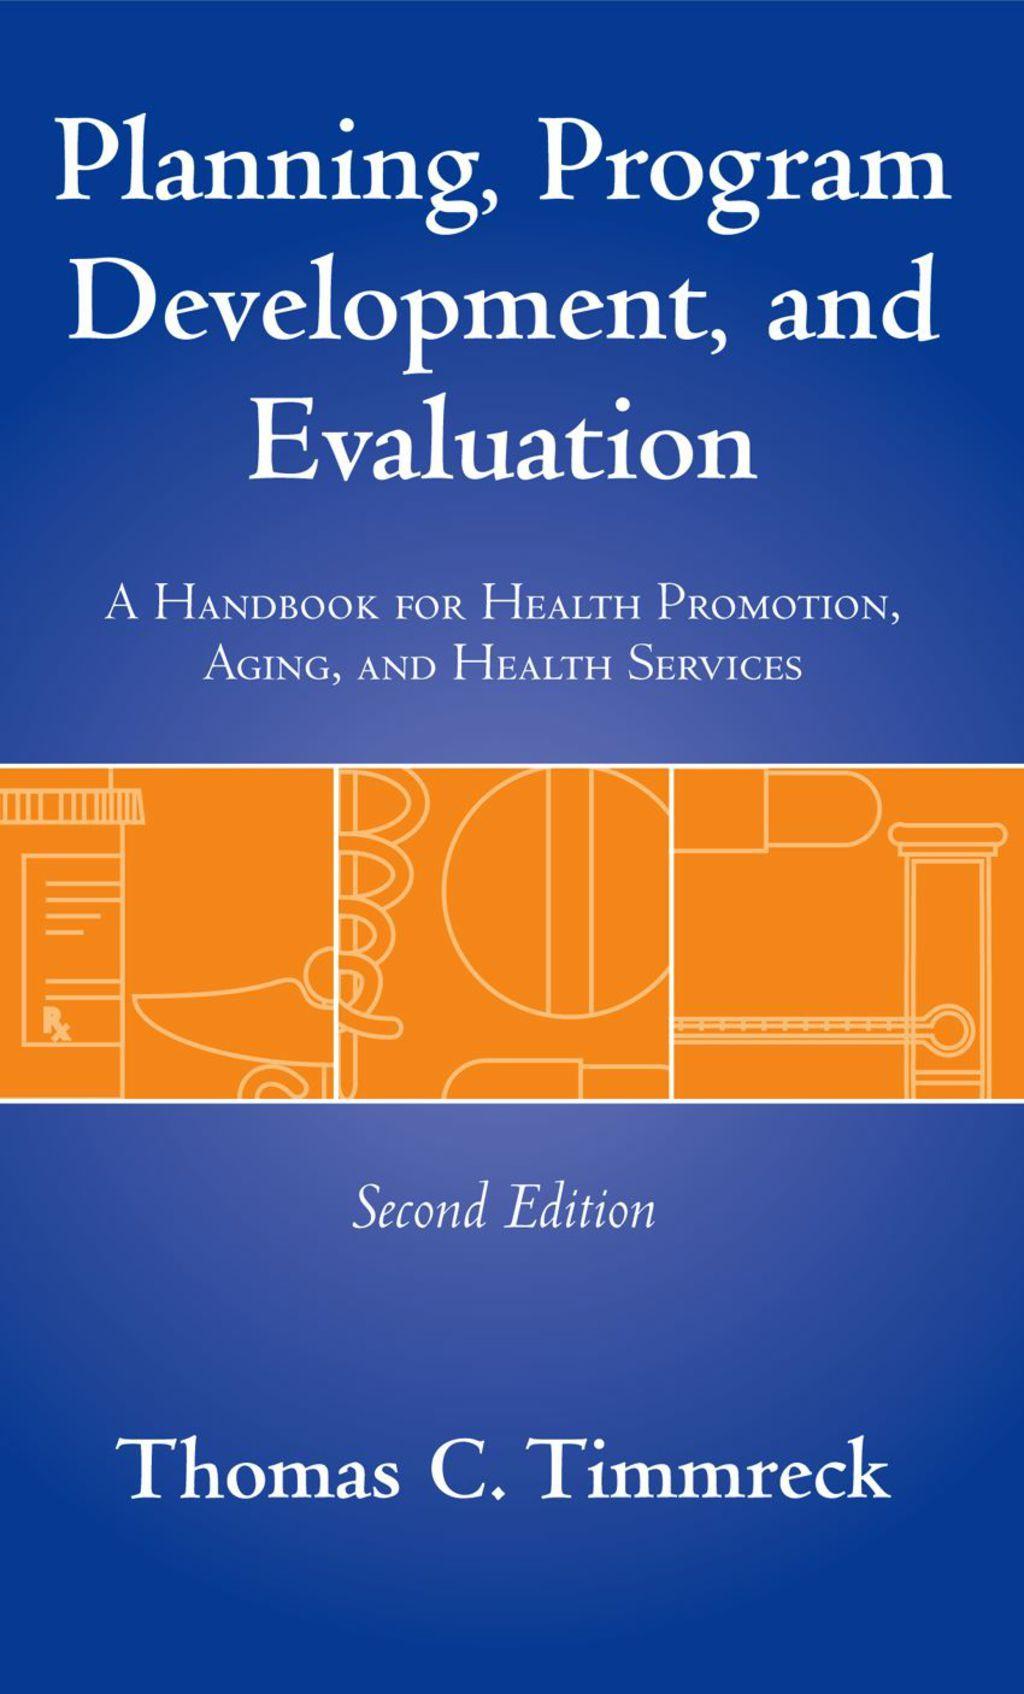 Planning Program Development and Evaluation (eBook Rental